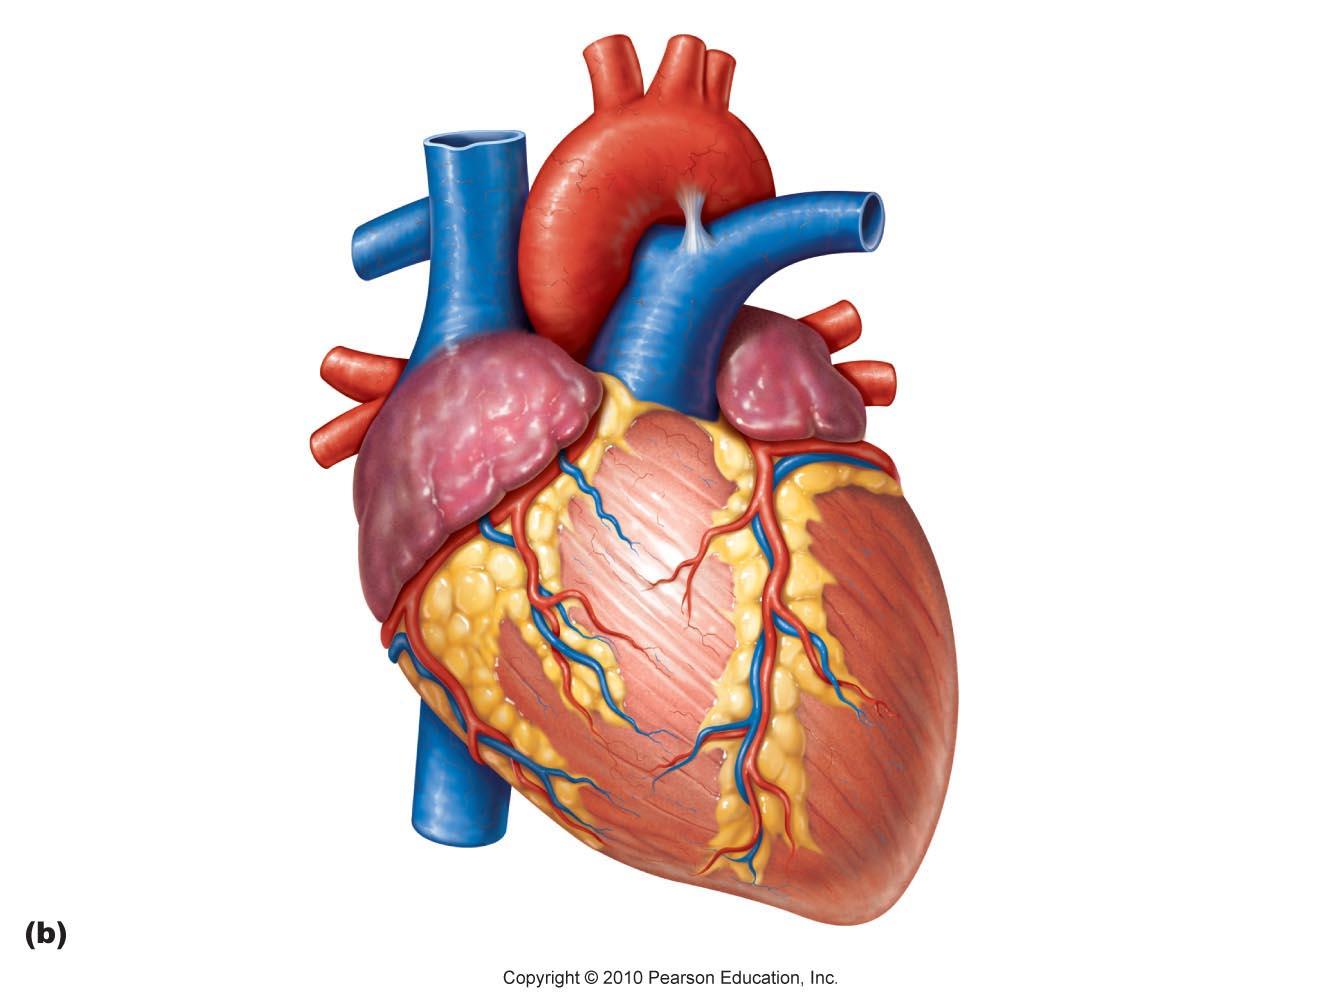 human heart diagram unlabeled free image Human Heart Diagram Cross Section human heart diagram unlabeled � free download